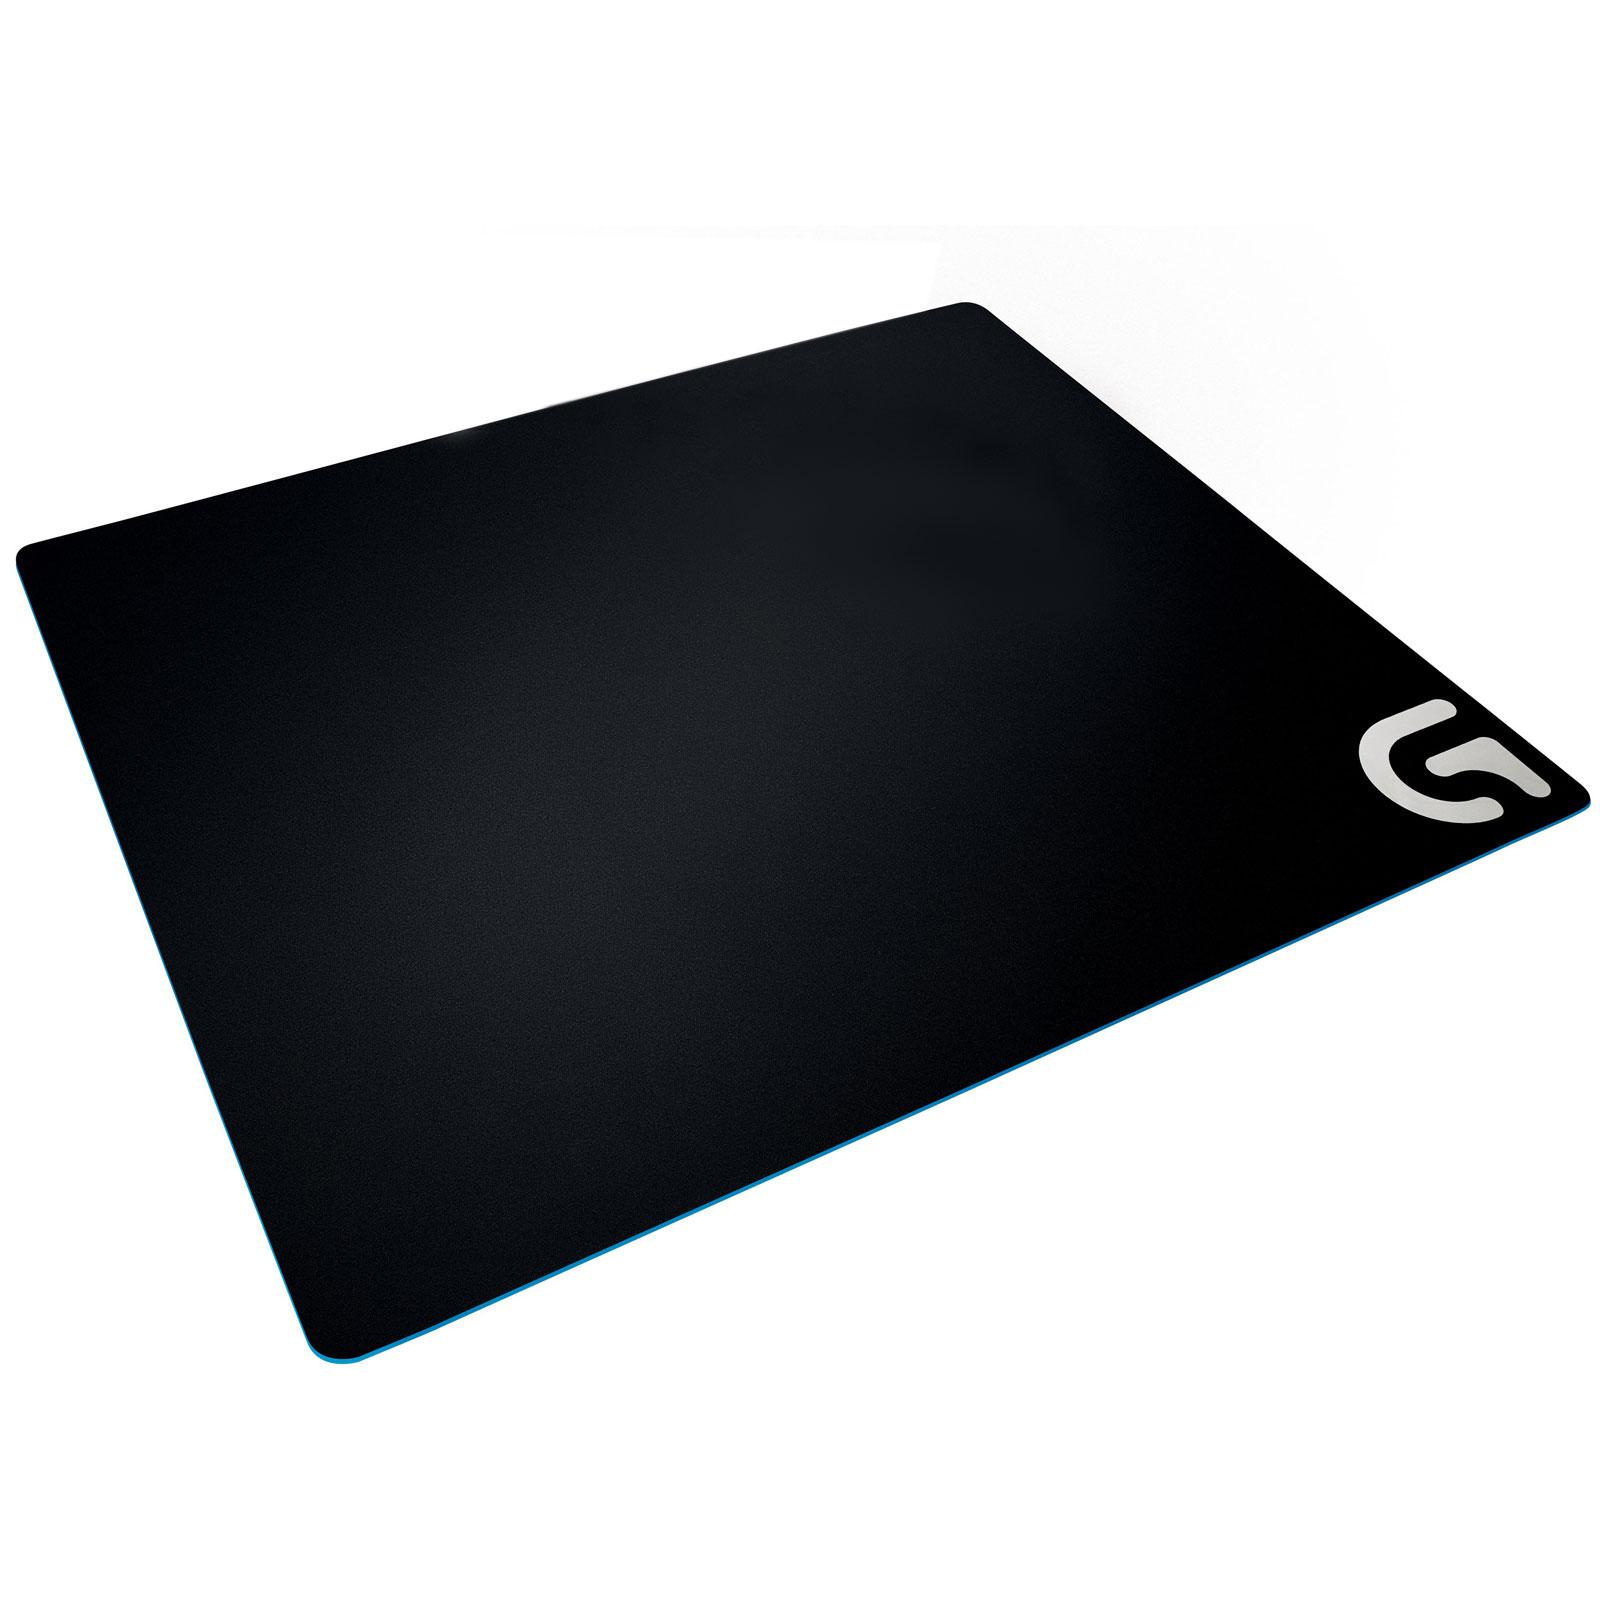 Carrelage Design tapis souris xxl : Logitech G640 Cloth Gaming Mouse Pad - Tapis de souris ...